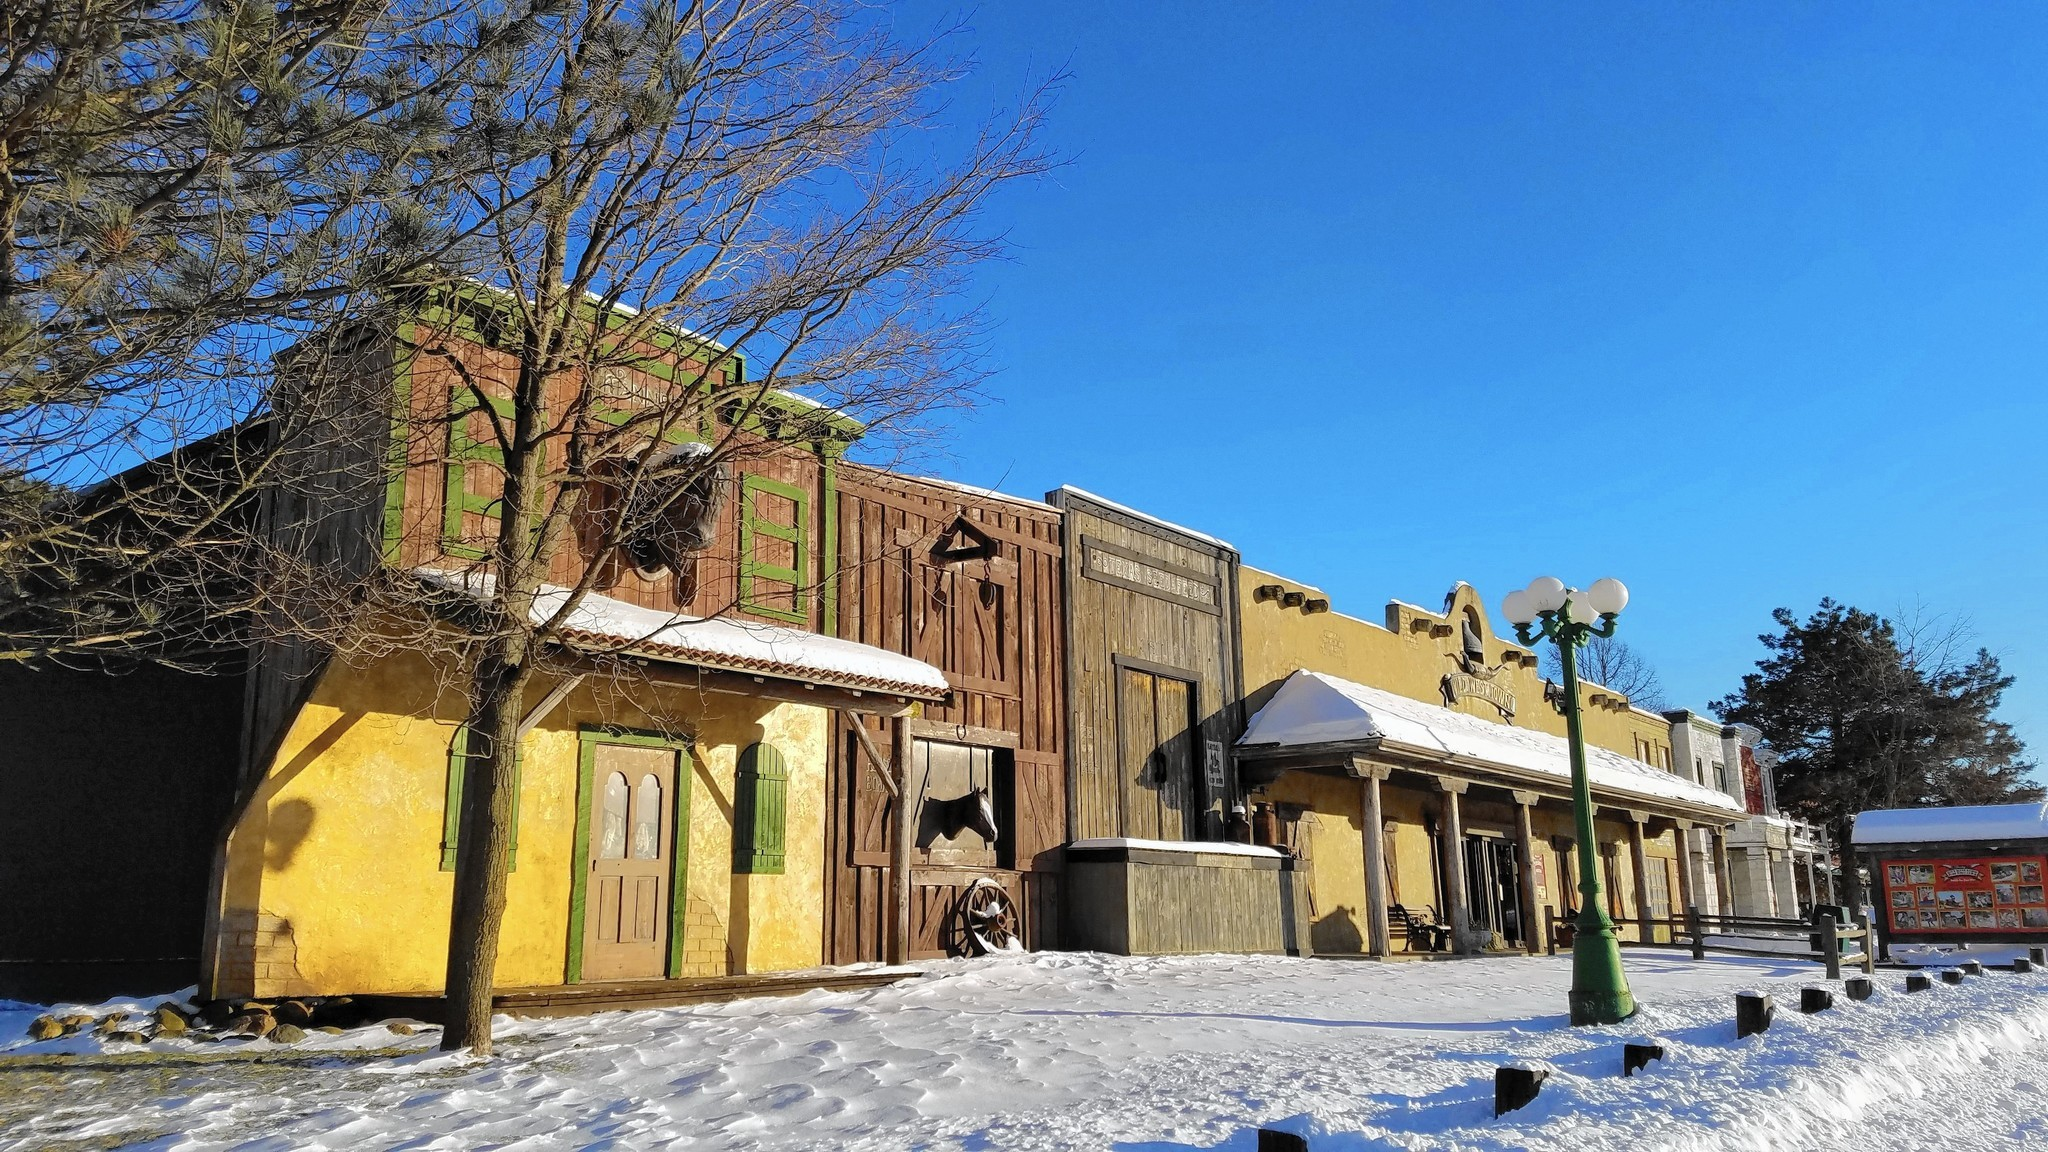 Wild West Town Elgin Courier News